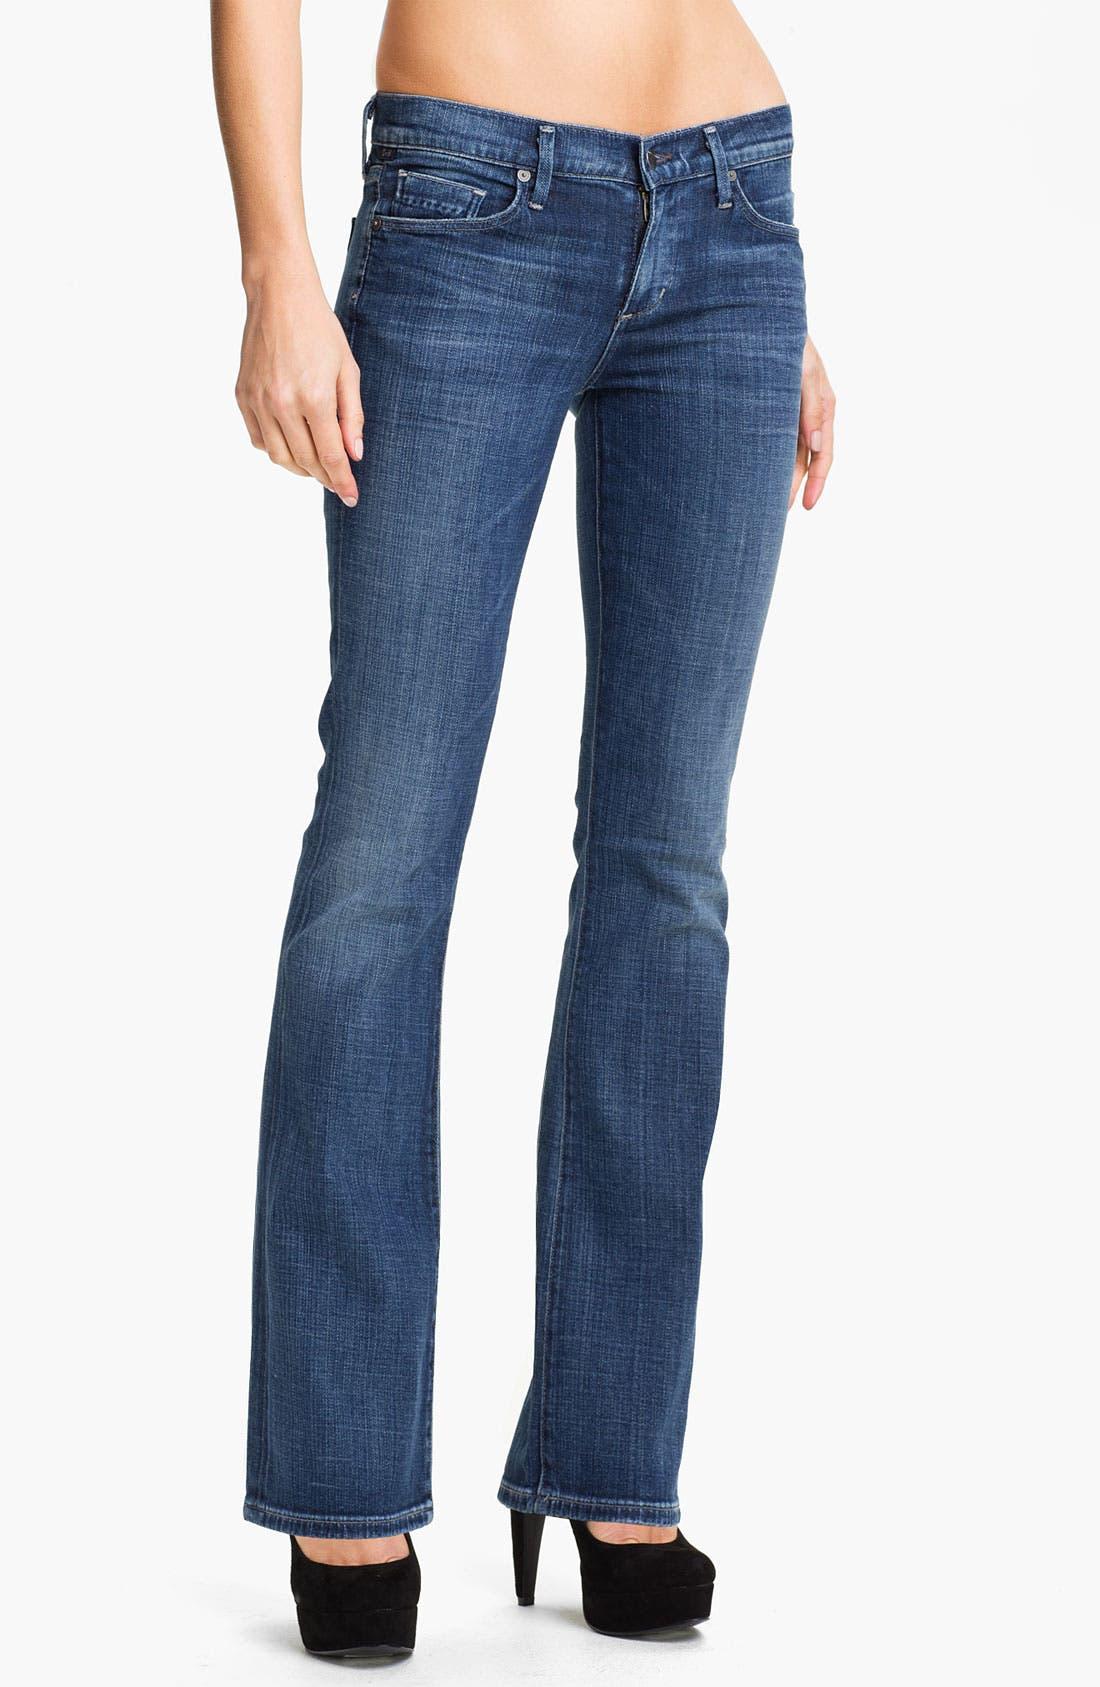 Main Image - Citizens of Humanity 'Dita' Slim Bootcut Jeans (Wedgewood) (Petite)